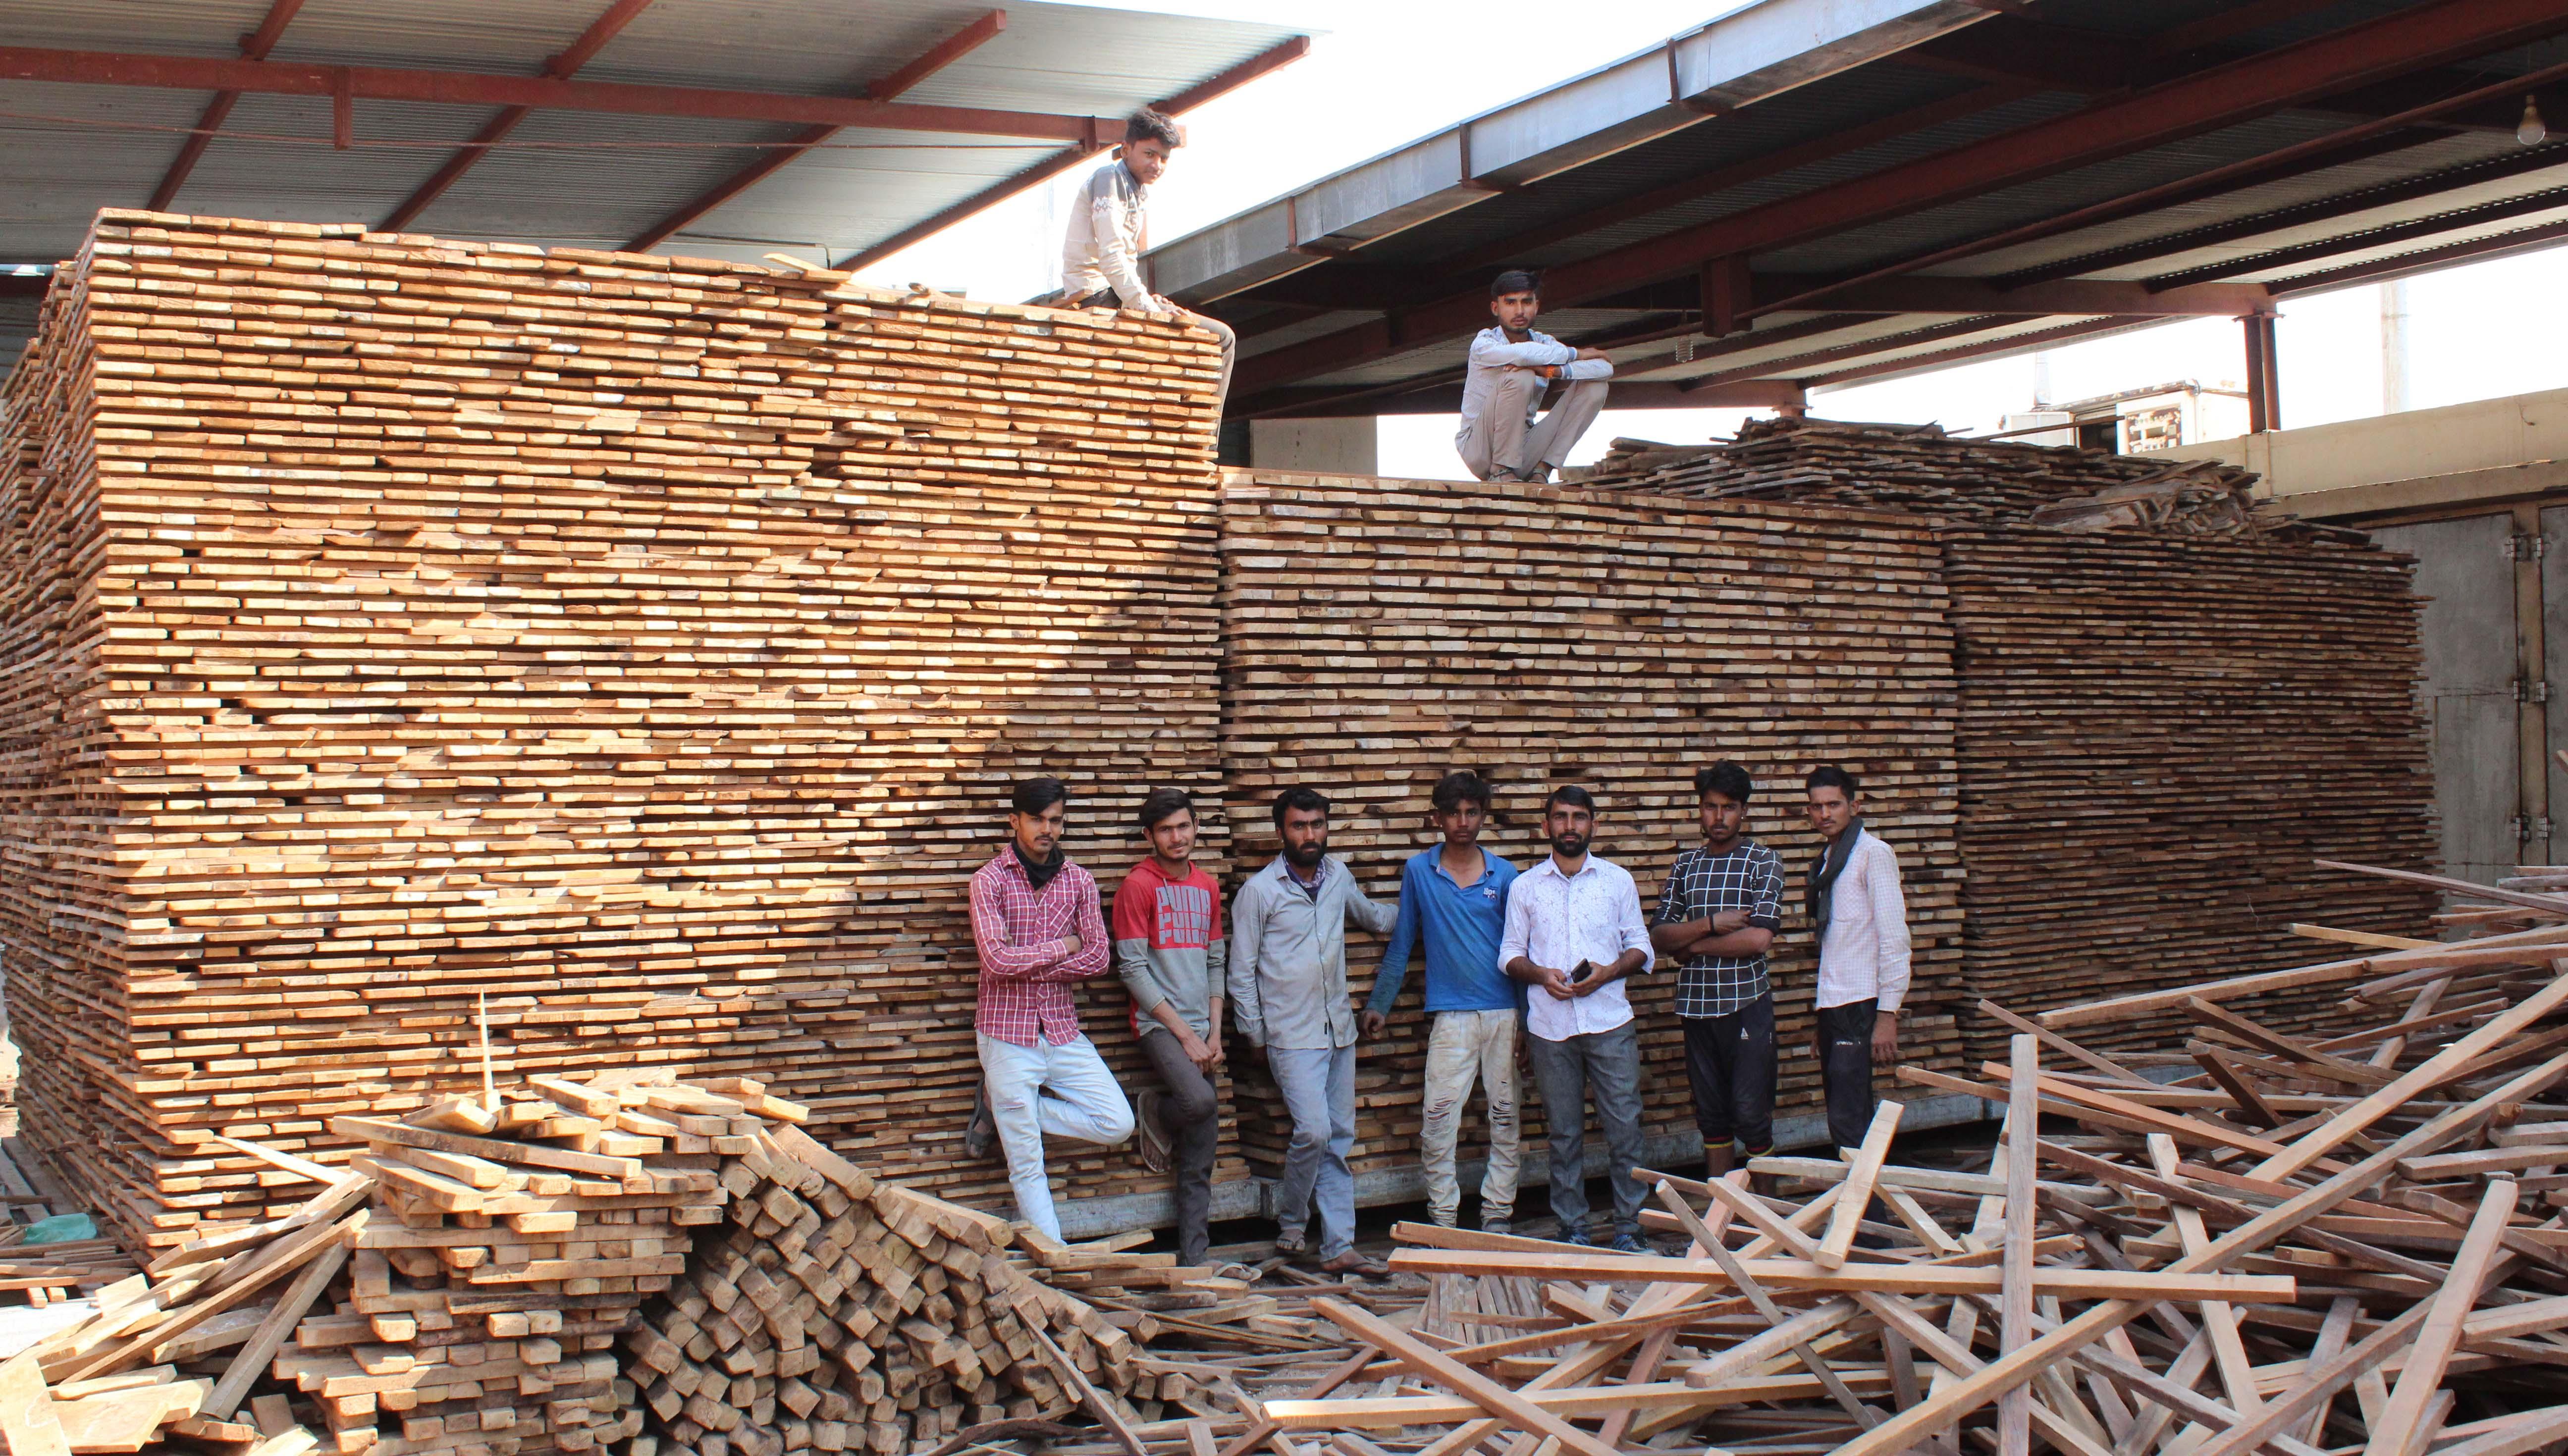 LeelaExpo Wood Ready For Seasoning